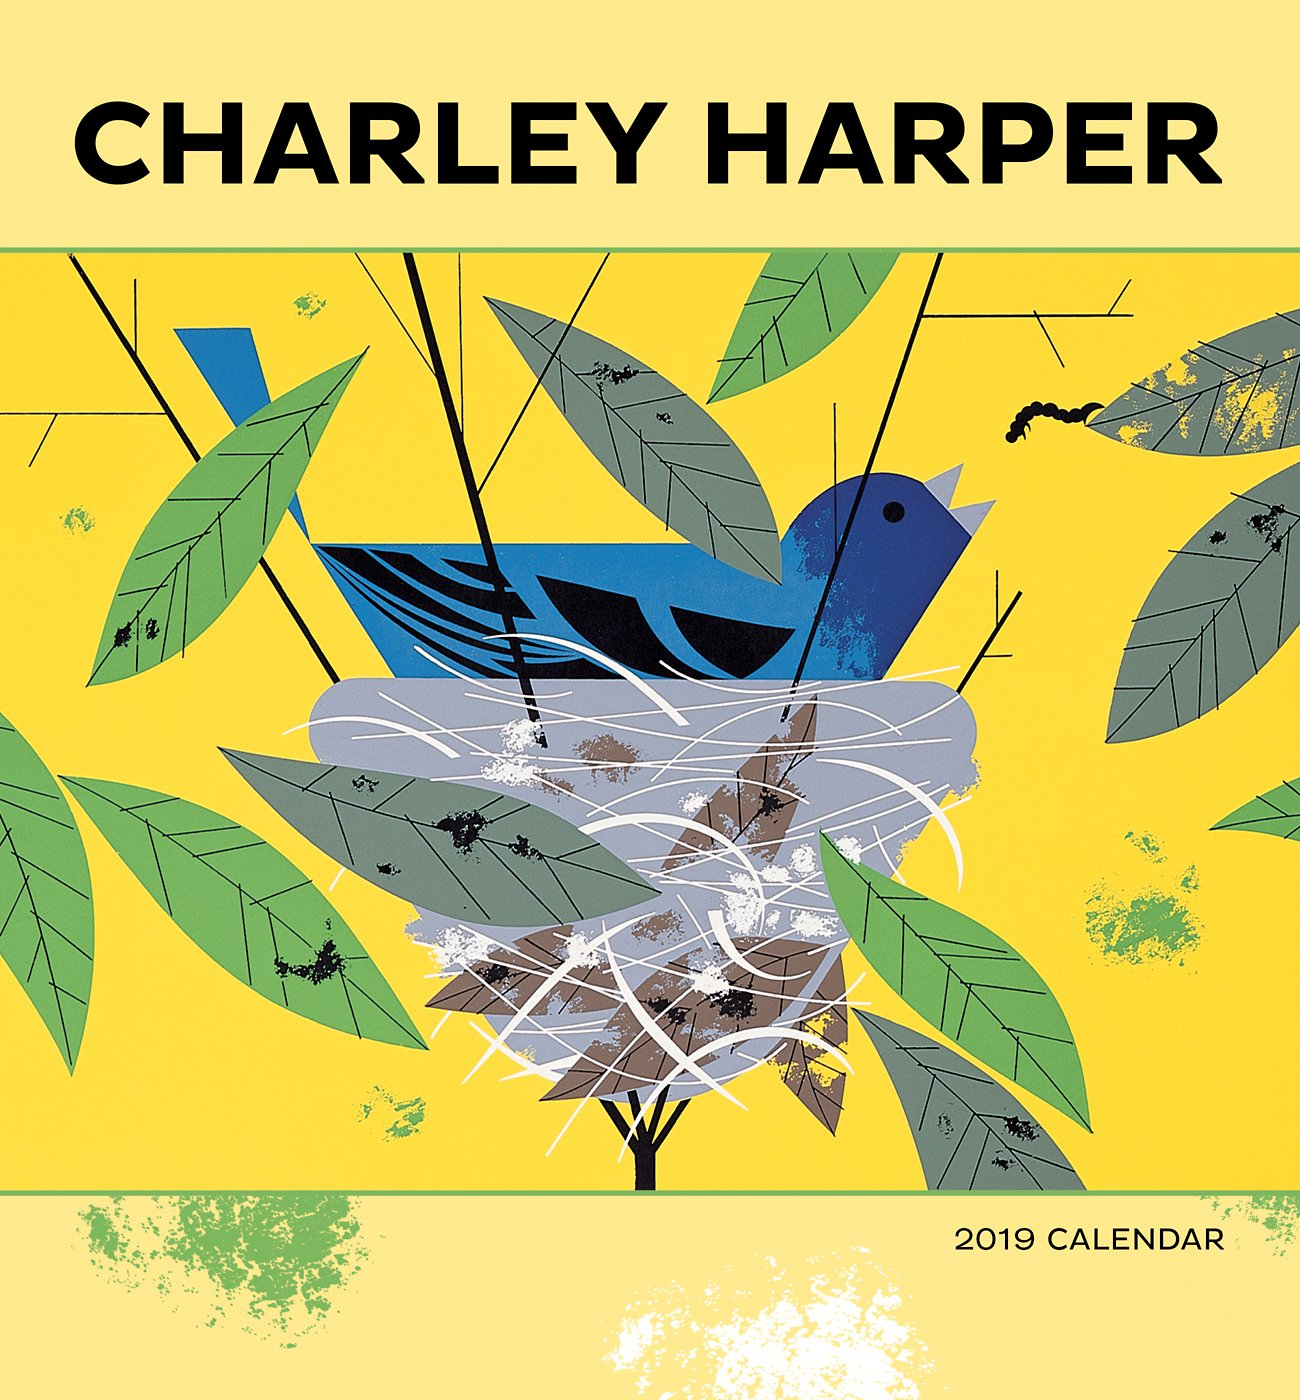 Charley Harper 2019 Mini Wall Calendar: Pomegranate Communications Inc., Charley  Harper: 9780764980008: Amazon.com: Books